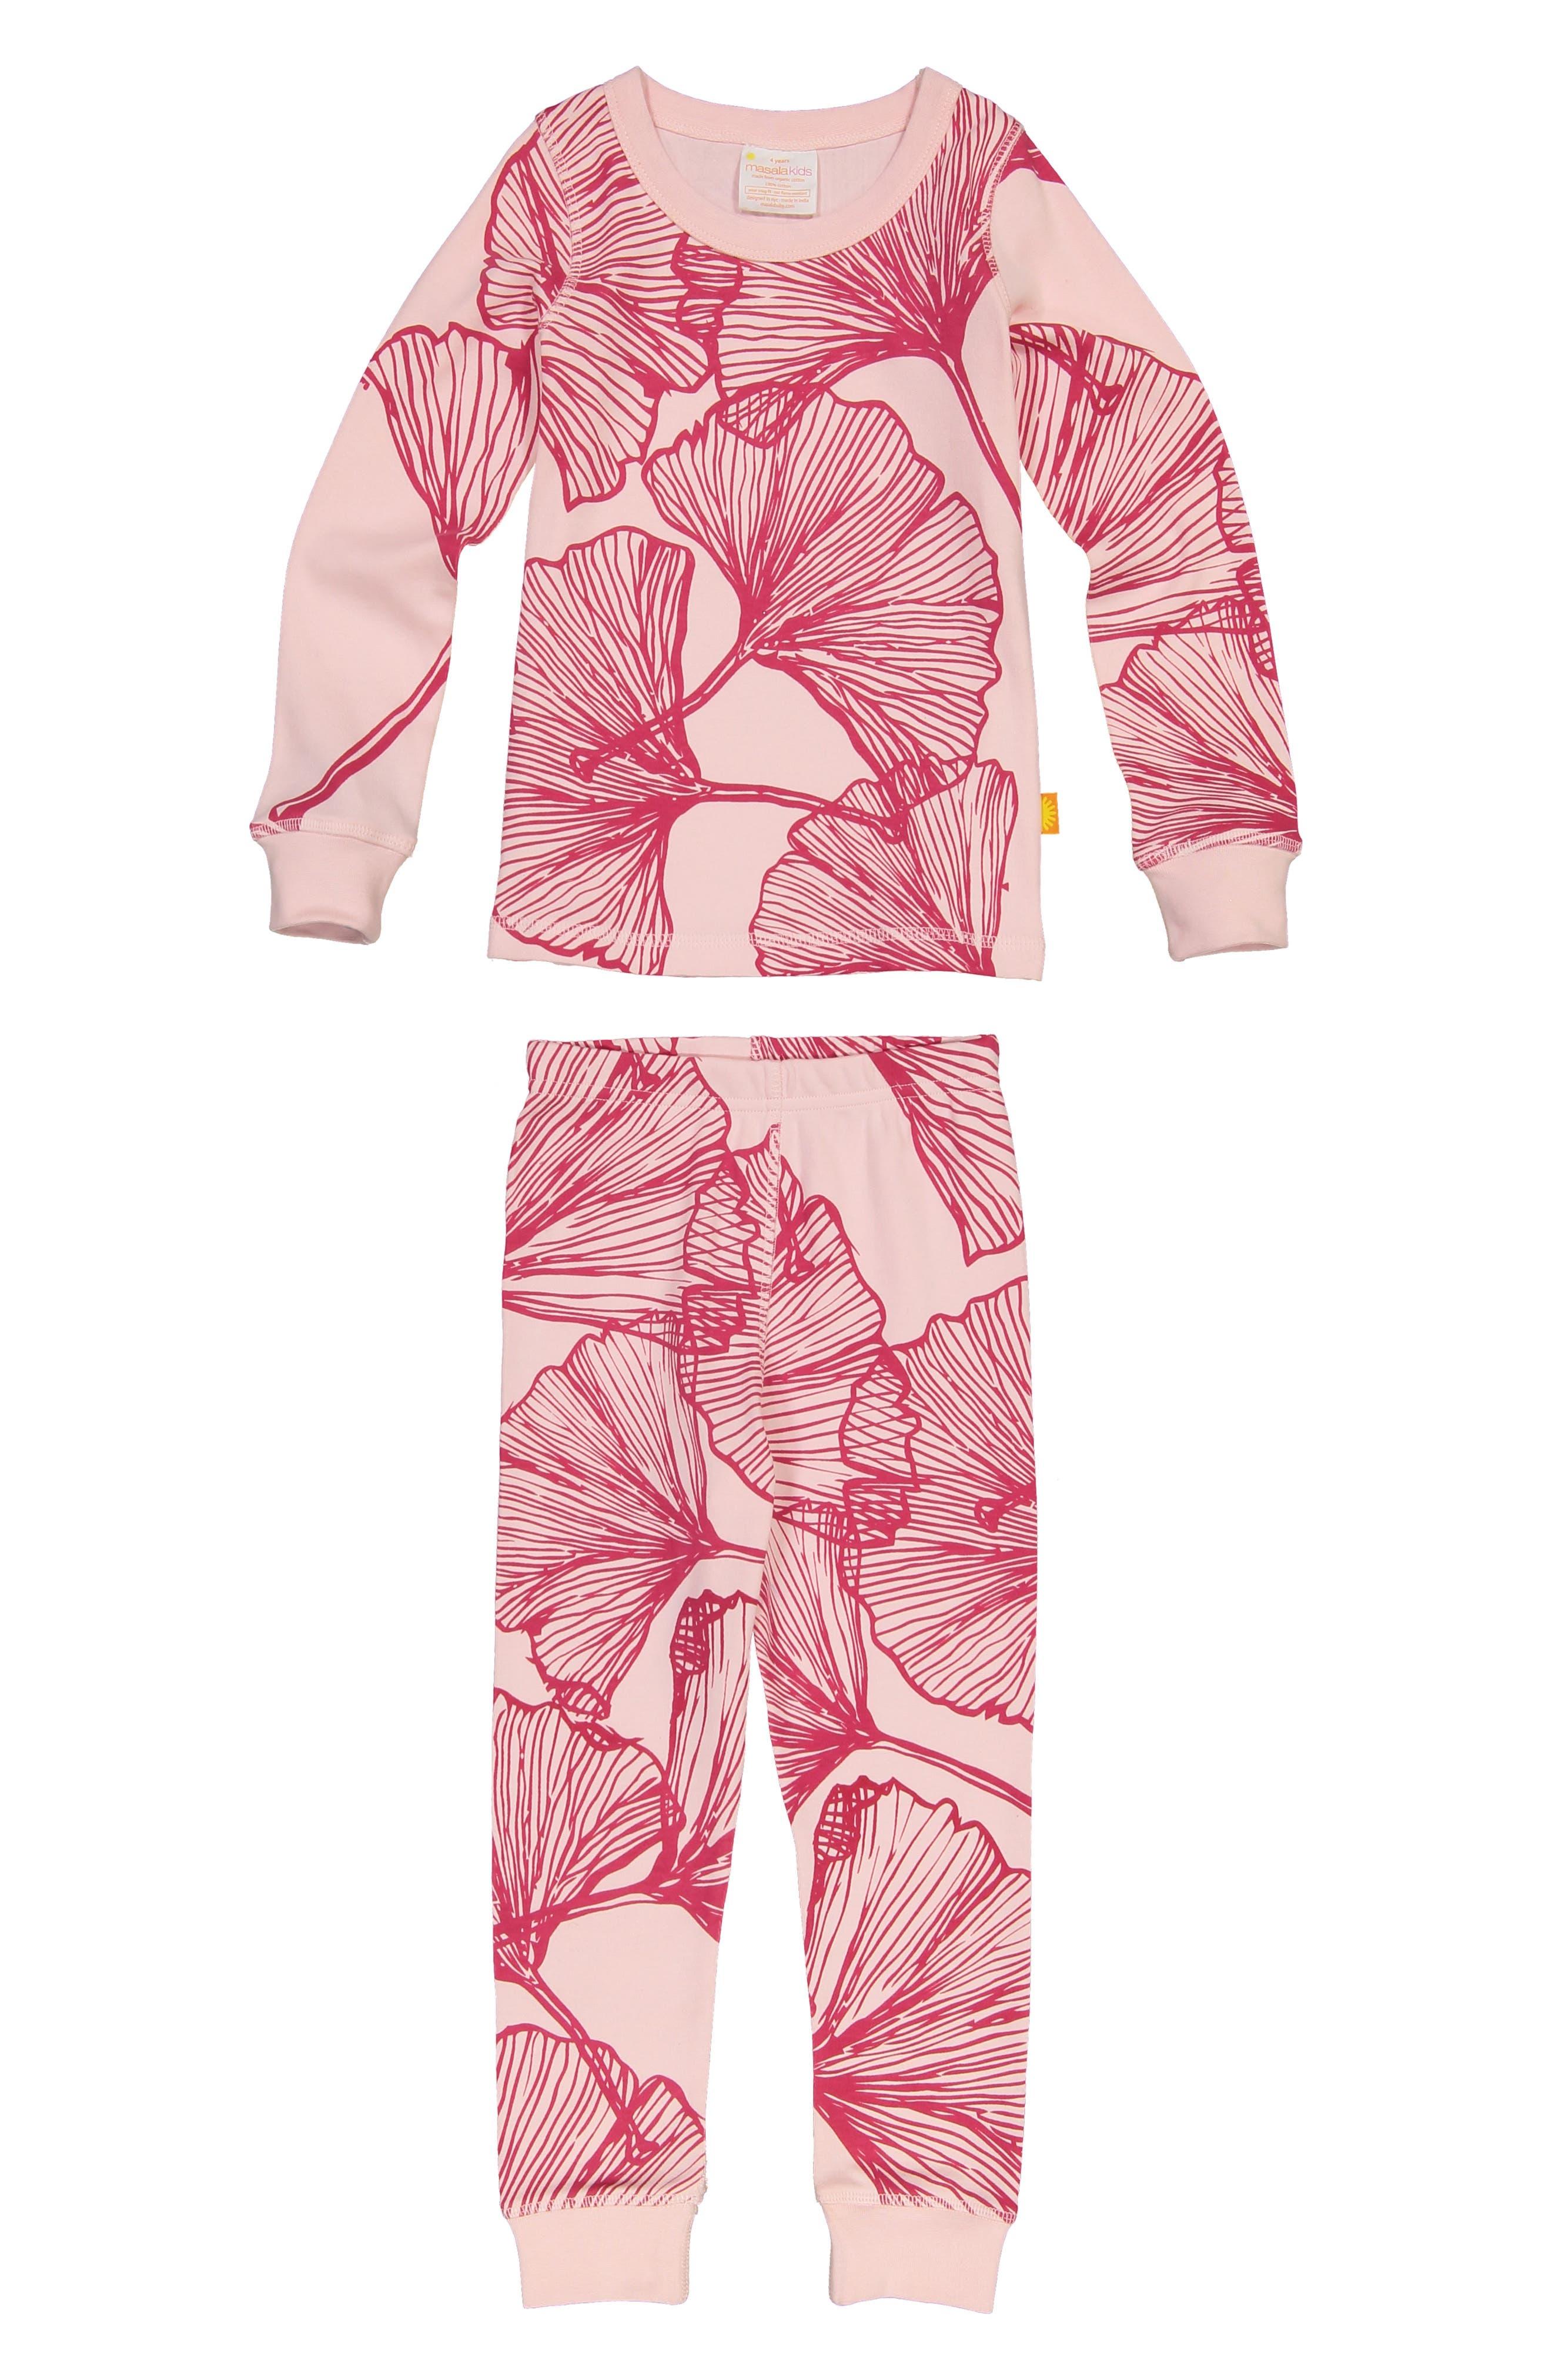 Toddler Girls Masala Baby Ginkgo Print Organic Cotton Fitted TwoPiece Pajamas Size 3Y  Pink